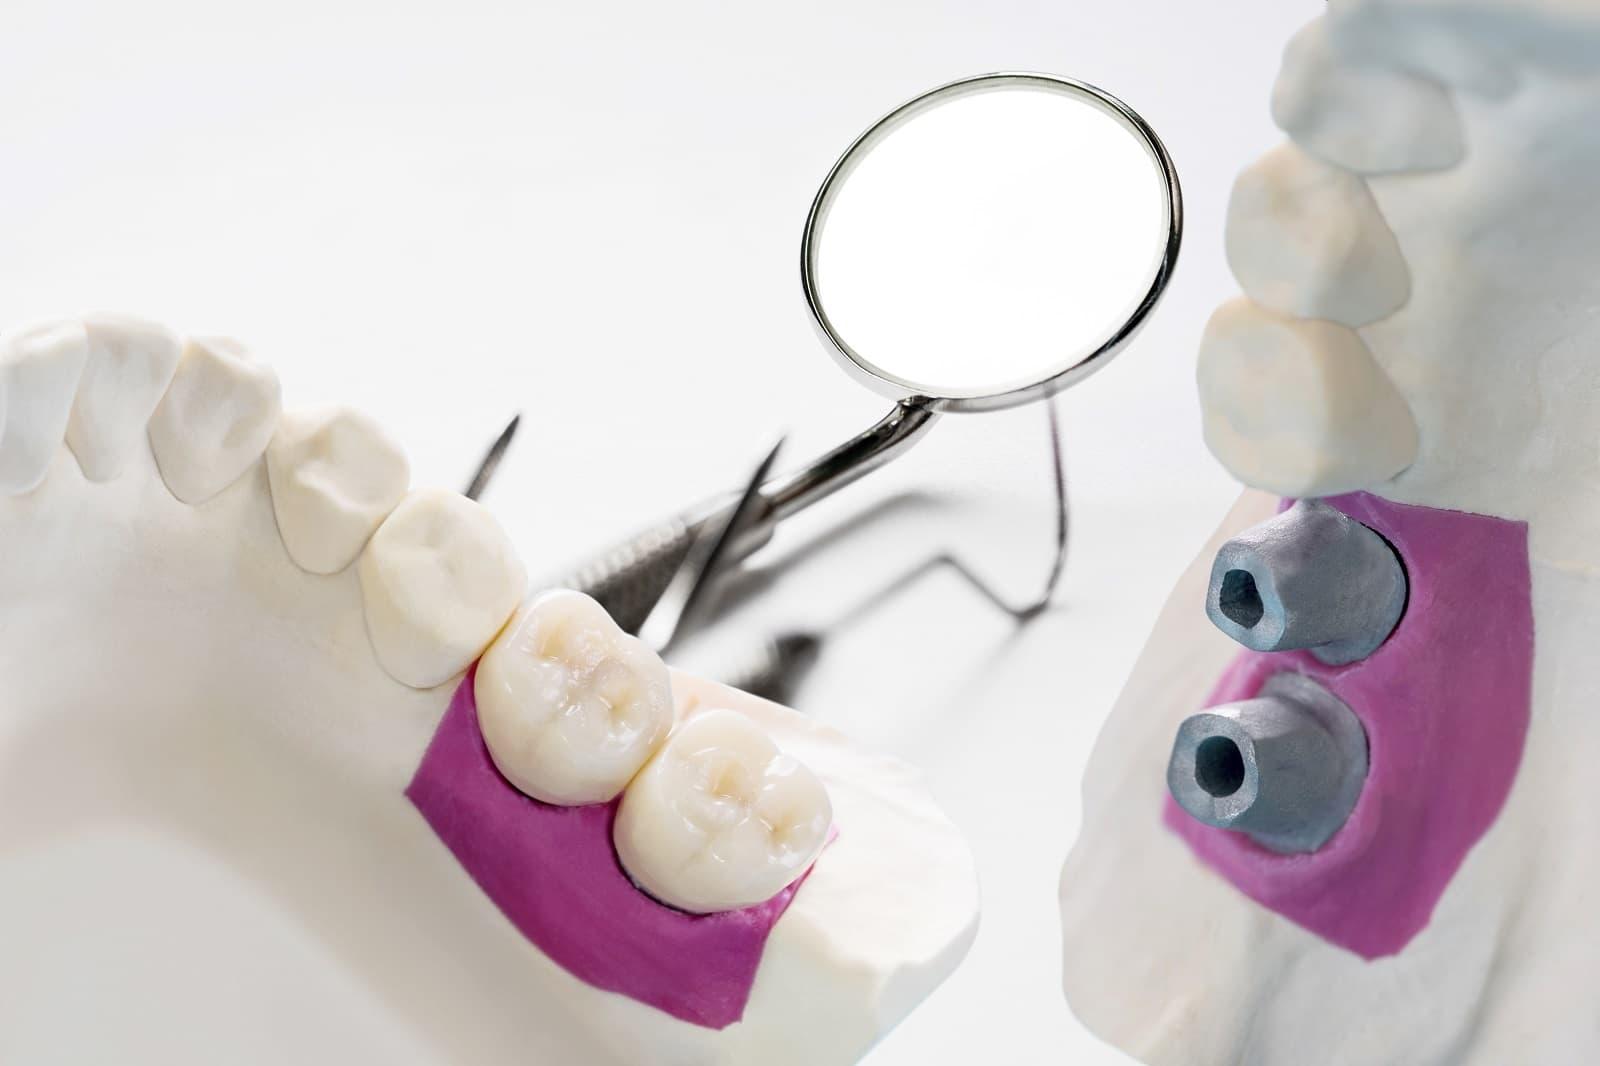 Portada permiso laboral por implante dental